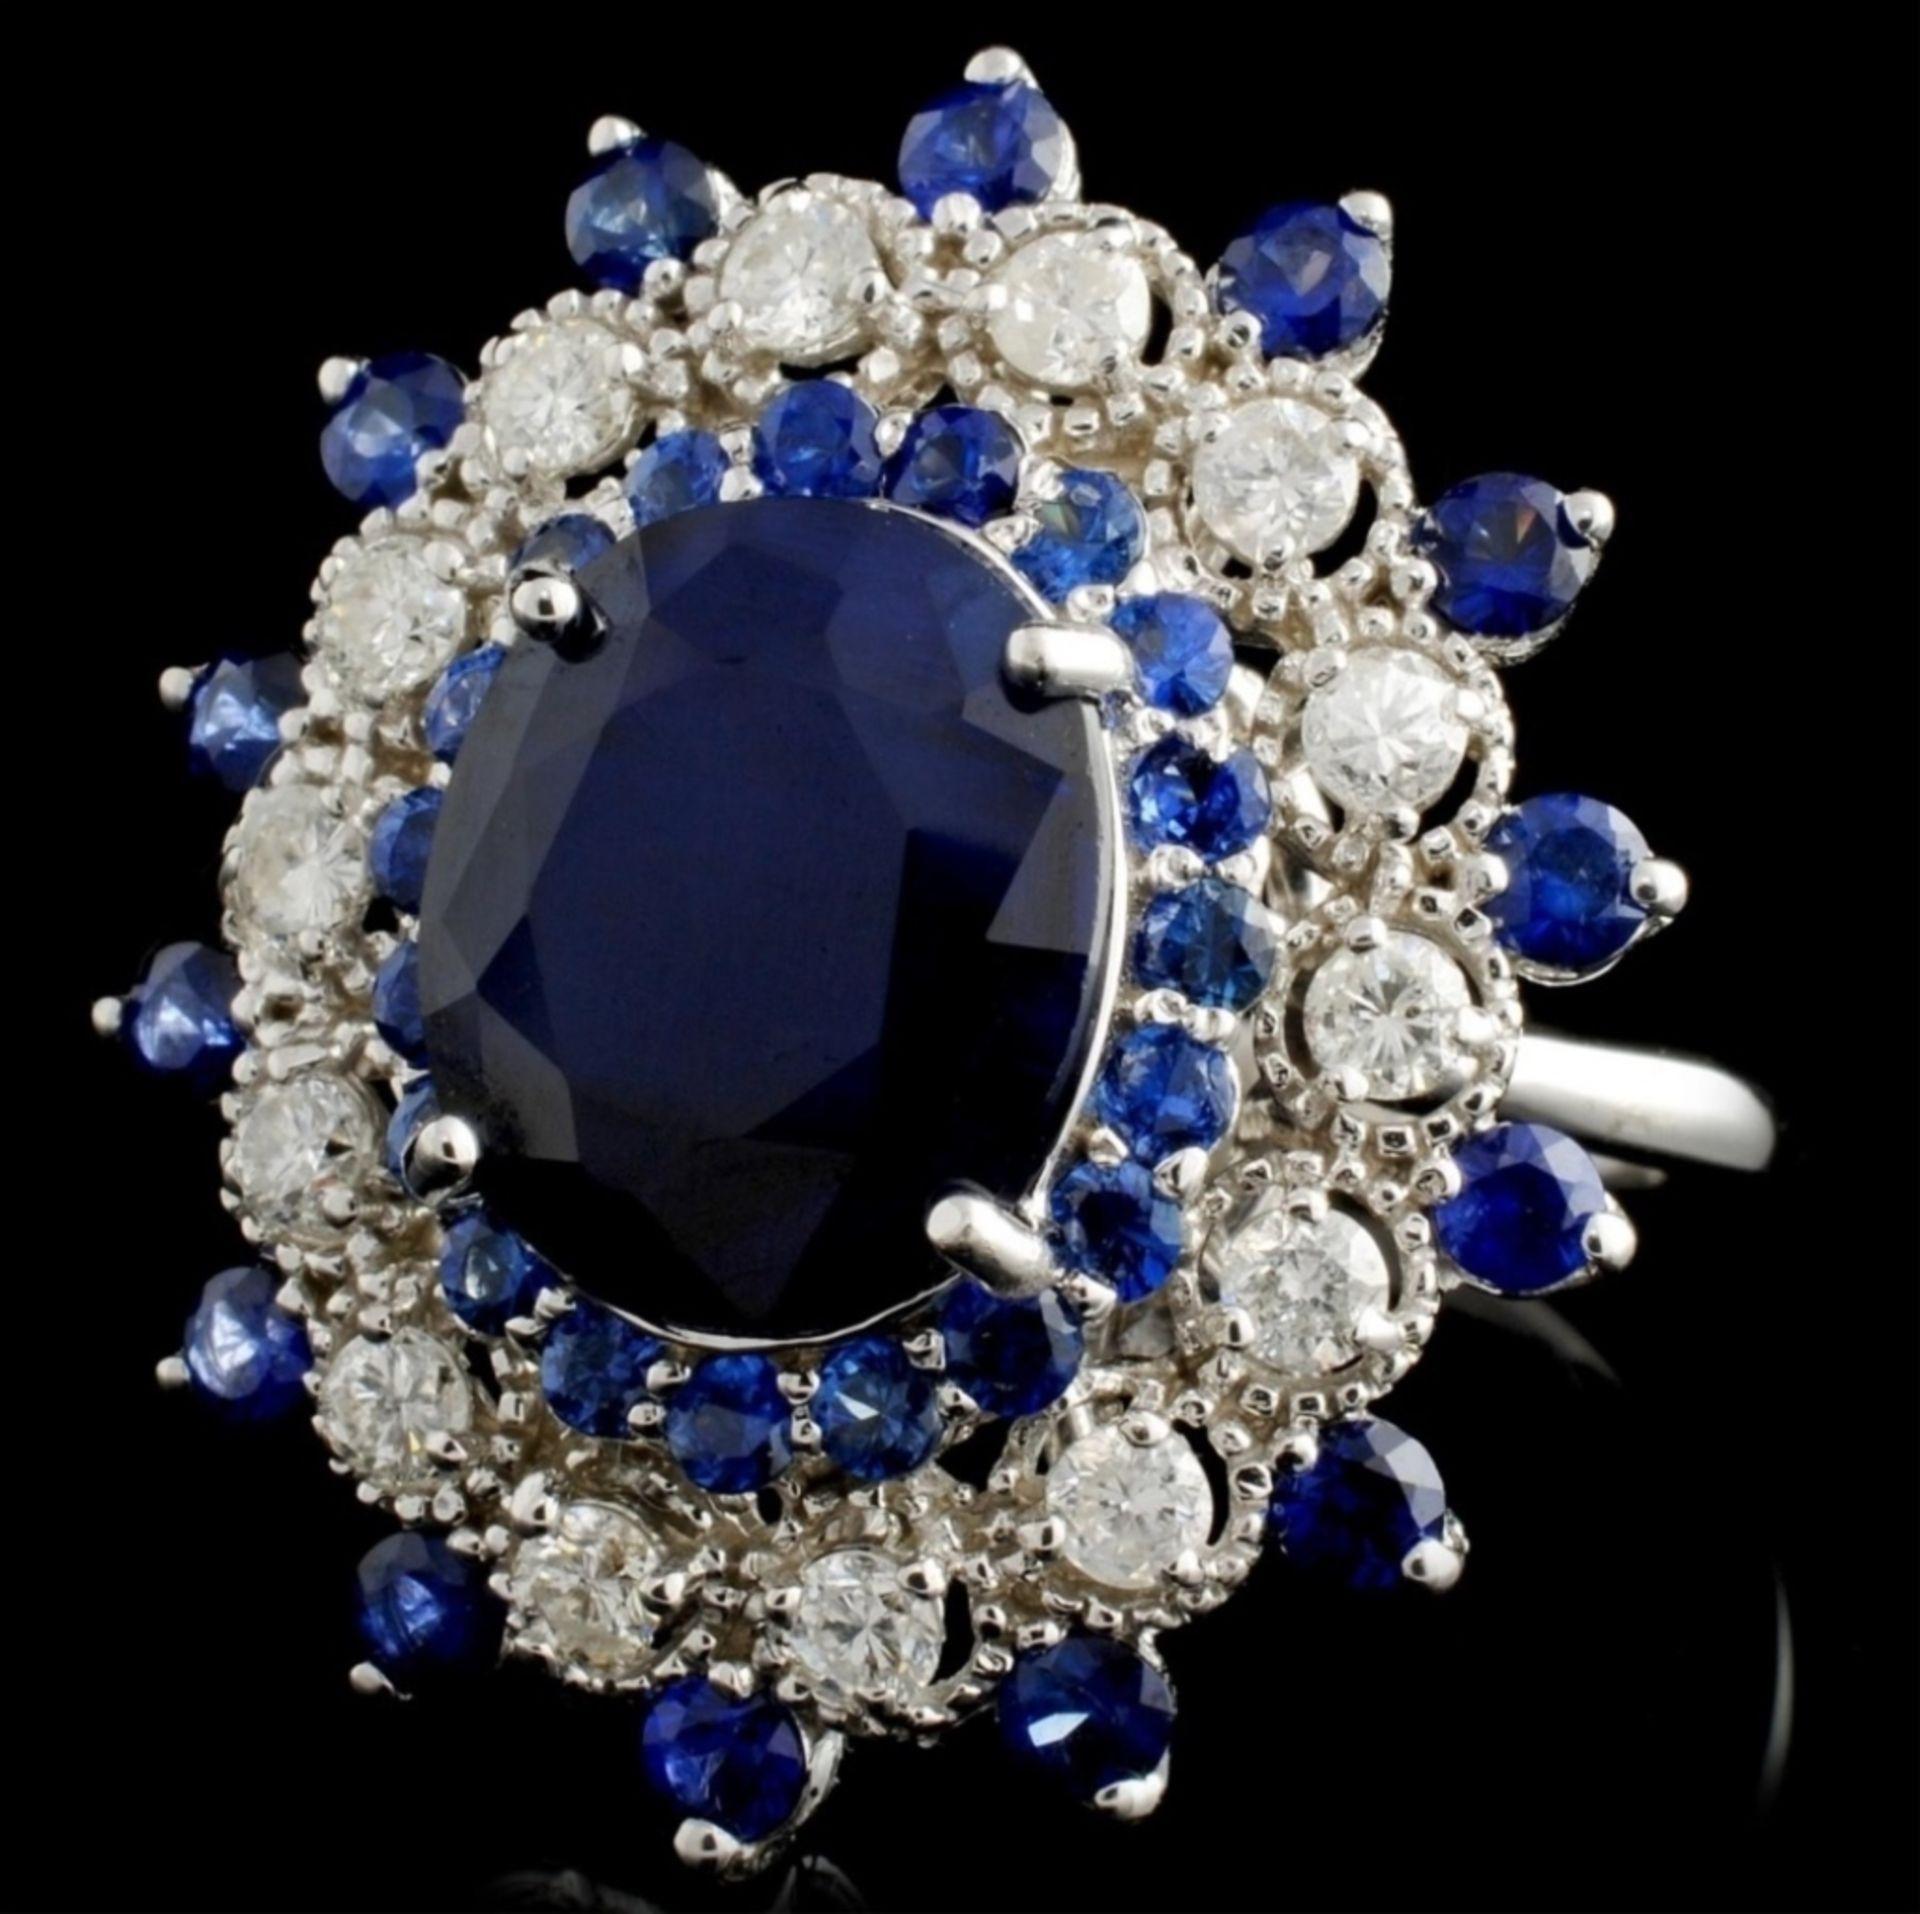 14K White Gold 7.50ct Sapphire & 1ct Diamond Ring - Image 2 of 4